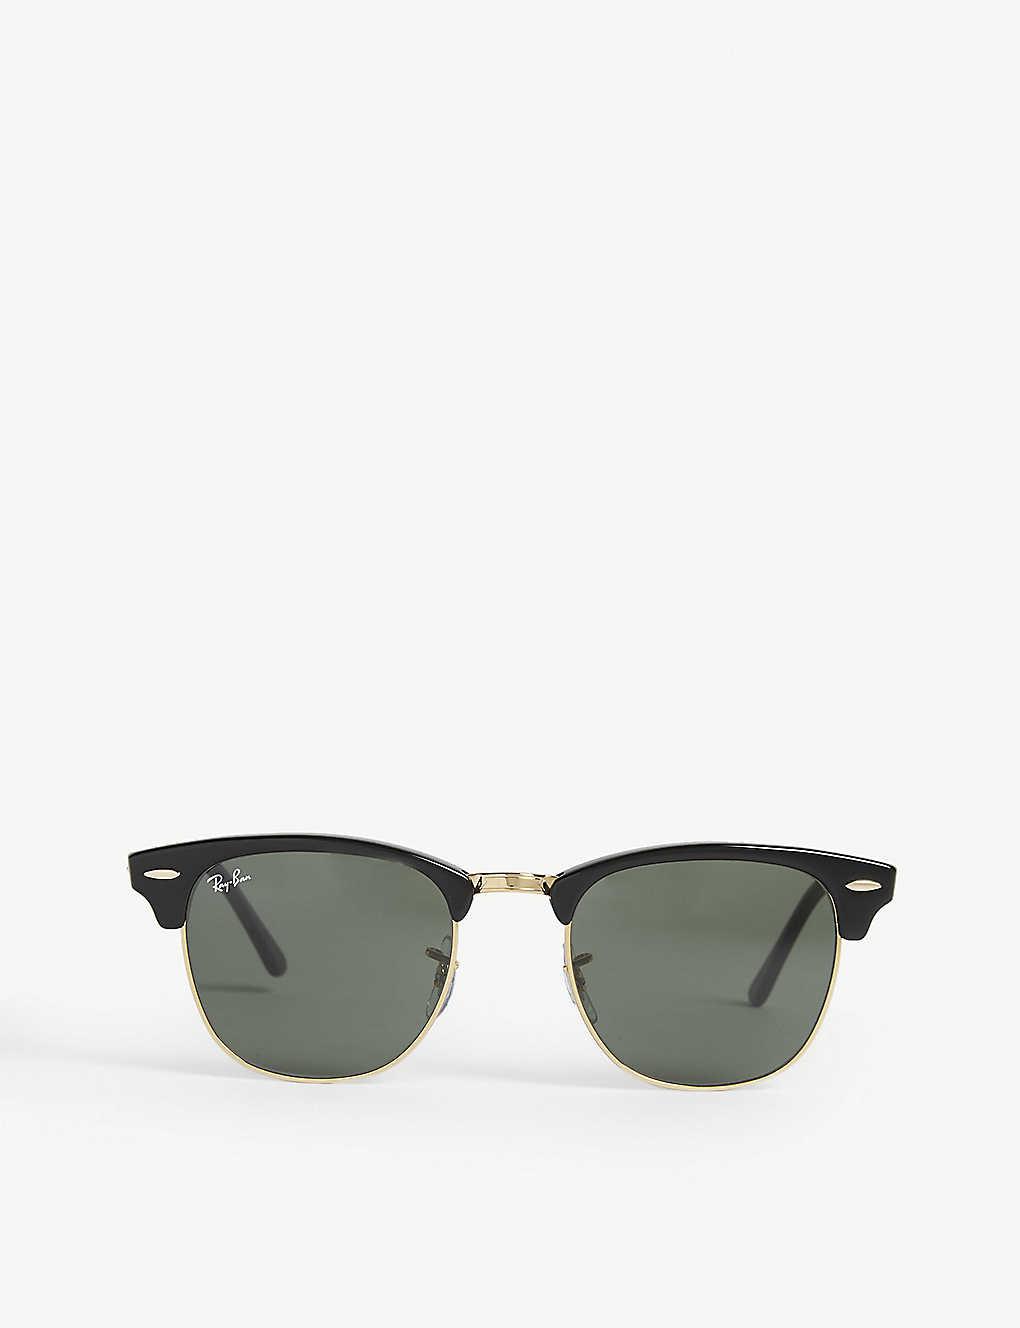 8706ae104b RAY-BAN - Clubmaster RB3016 sunglasses